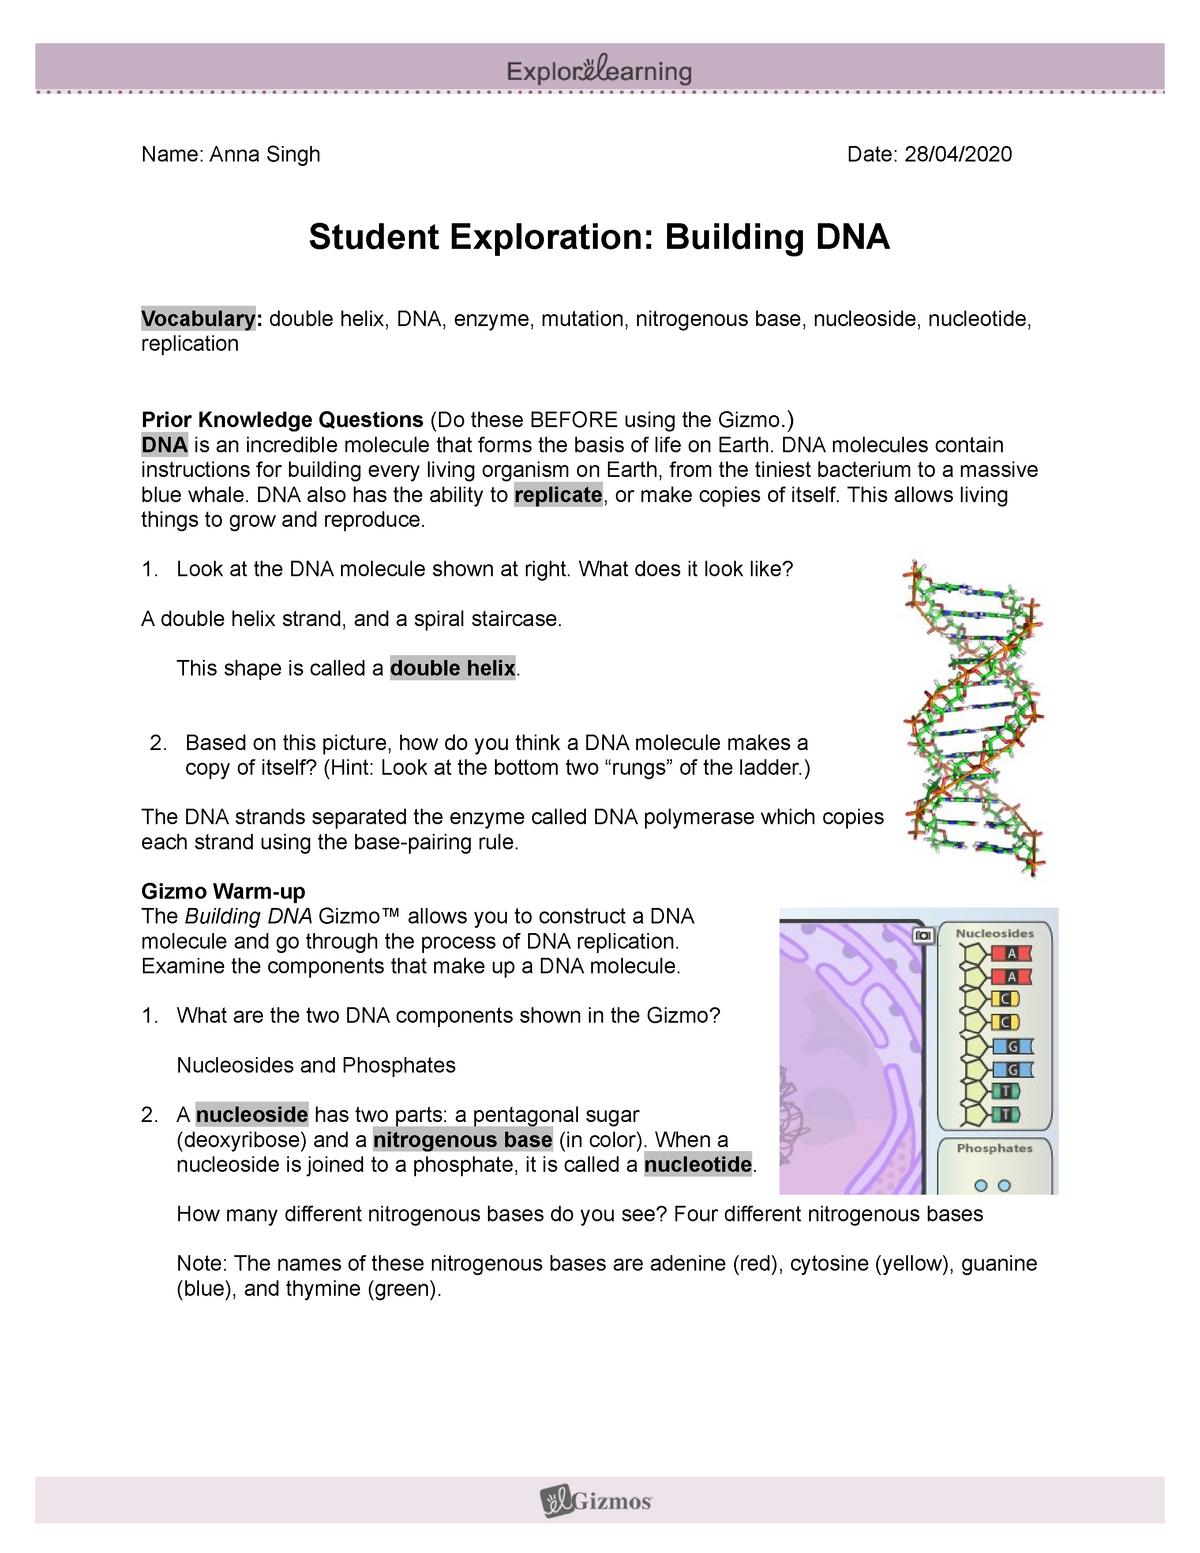 Building Dna Gizmo Answer Key  Student Exploration Sheet ...